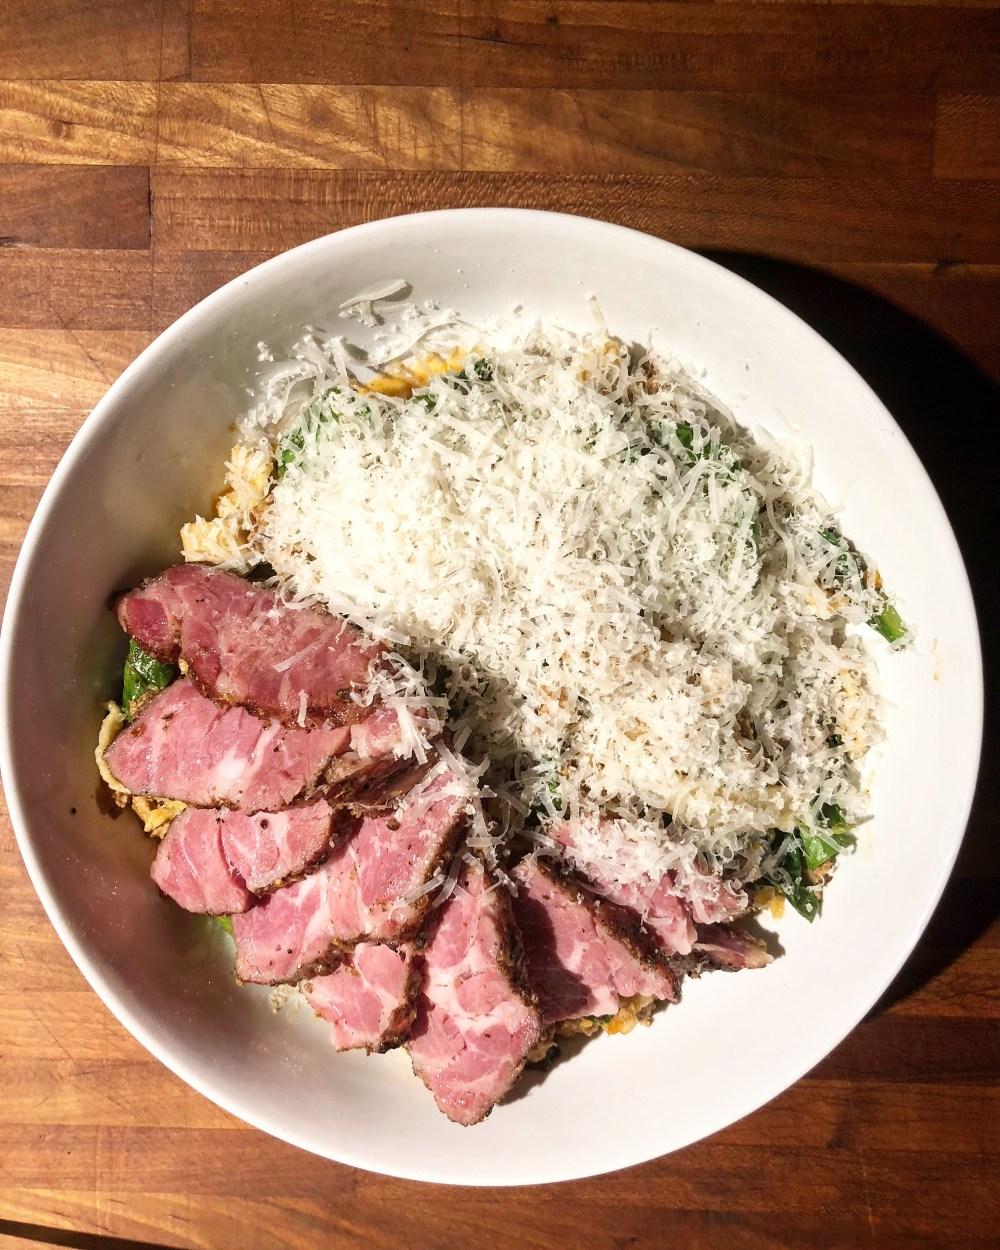 Lamb bolognese, Michigan rye fettuccine, greens, parmigiana reggiano, House lamb neck pastrami. Mabel Gray